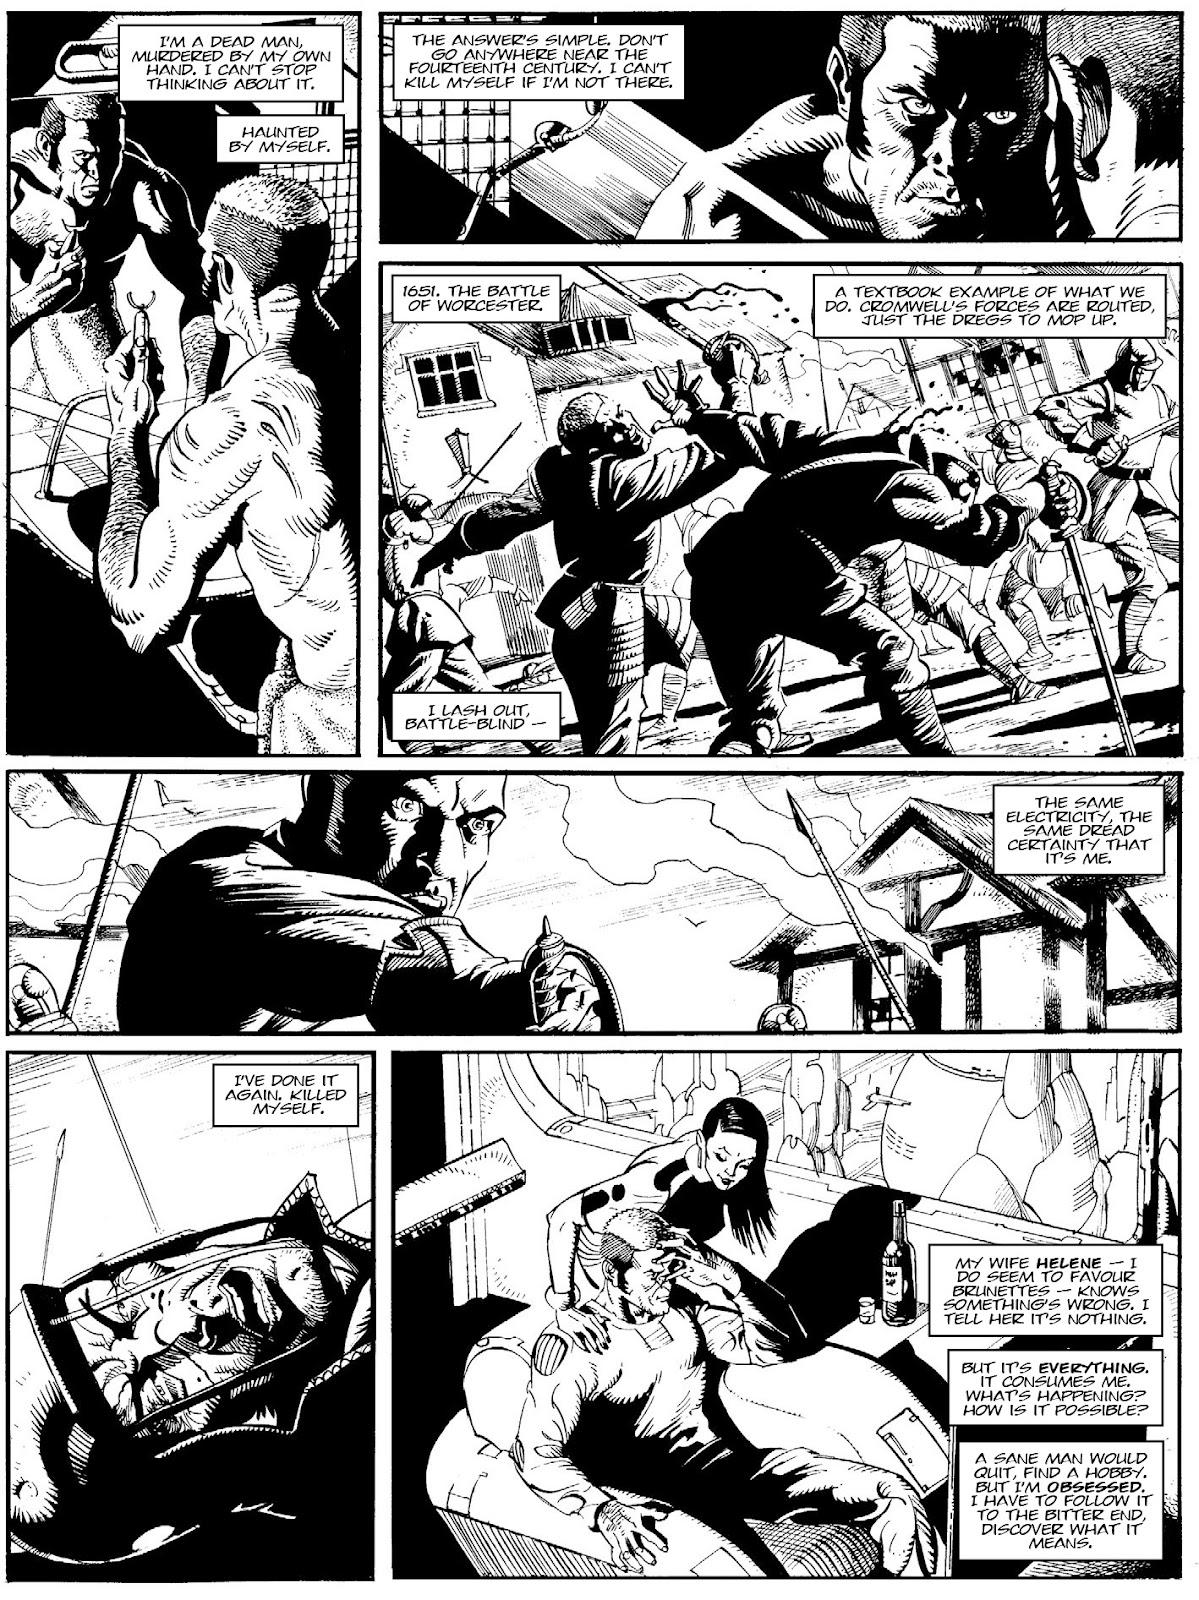 Judge Dredd Megazine (Vol. 5) issue 427 - Page 112